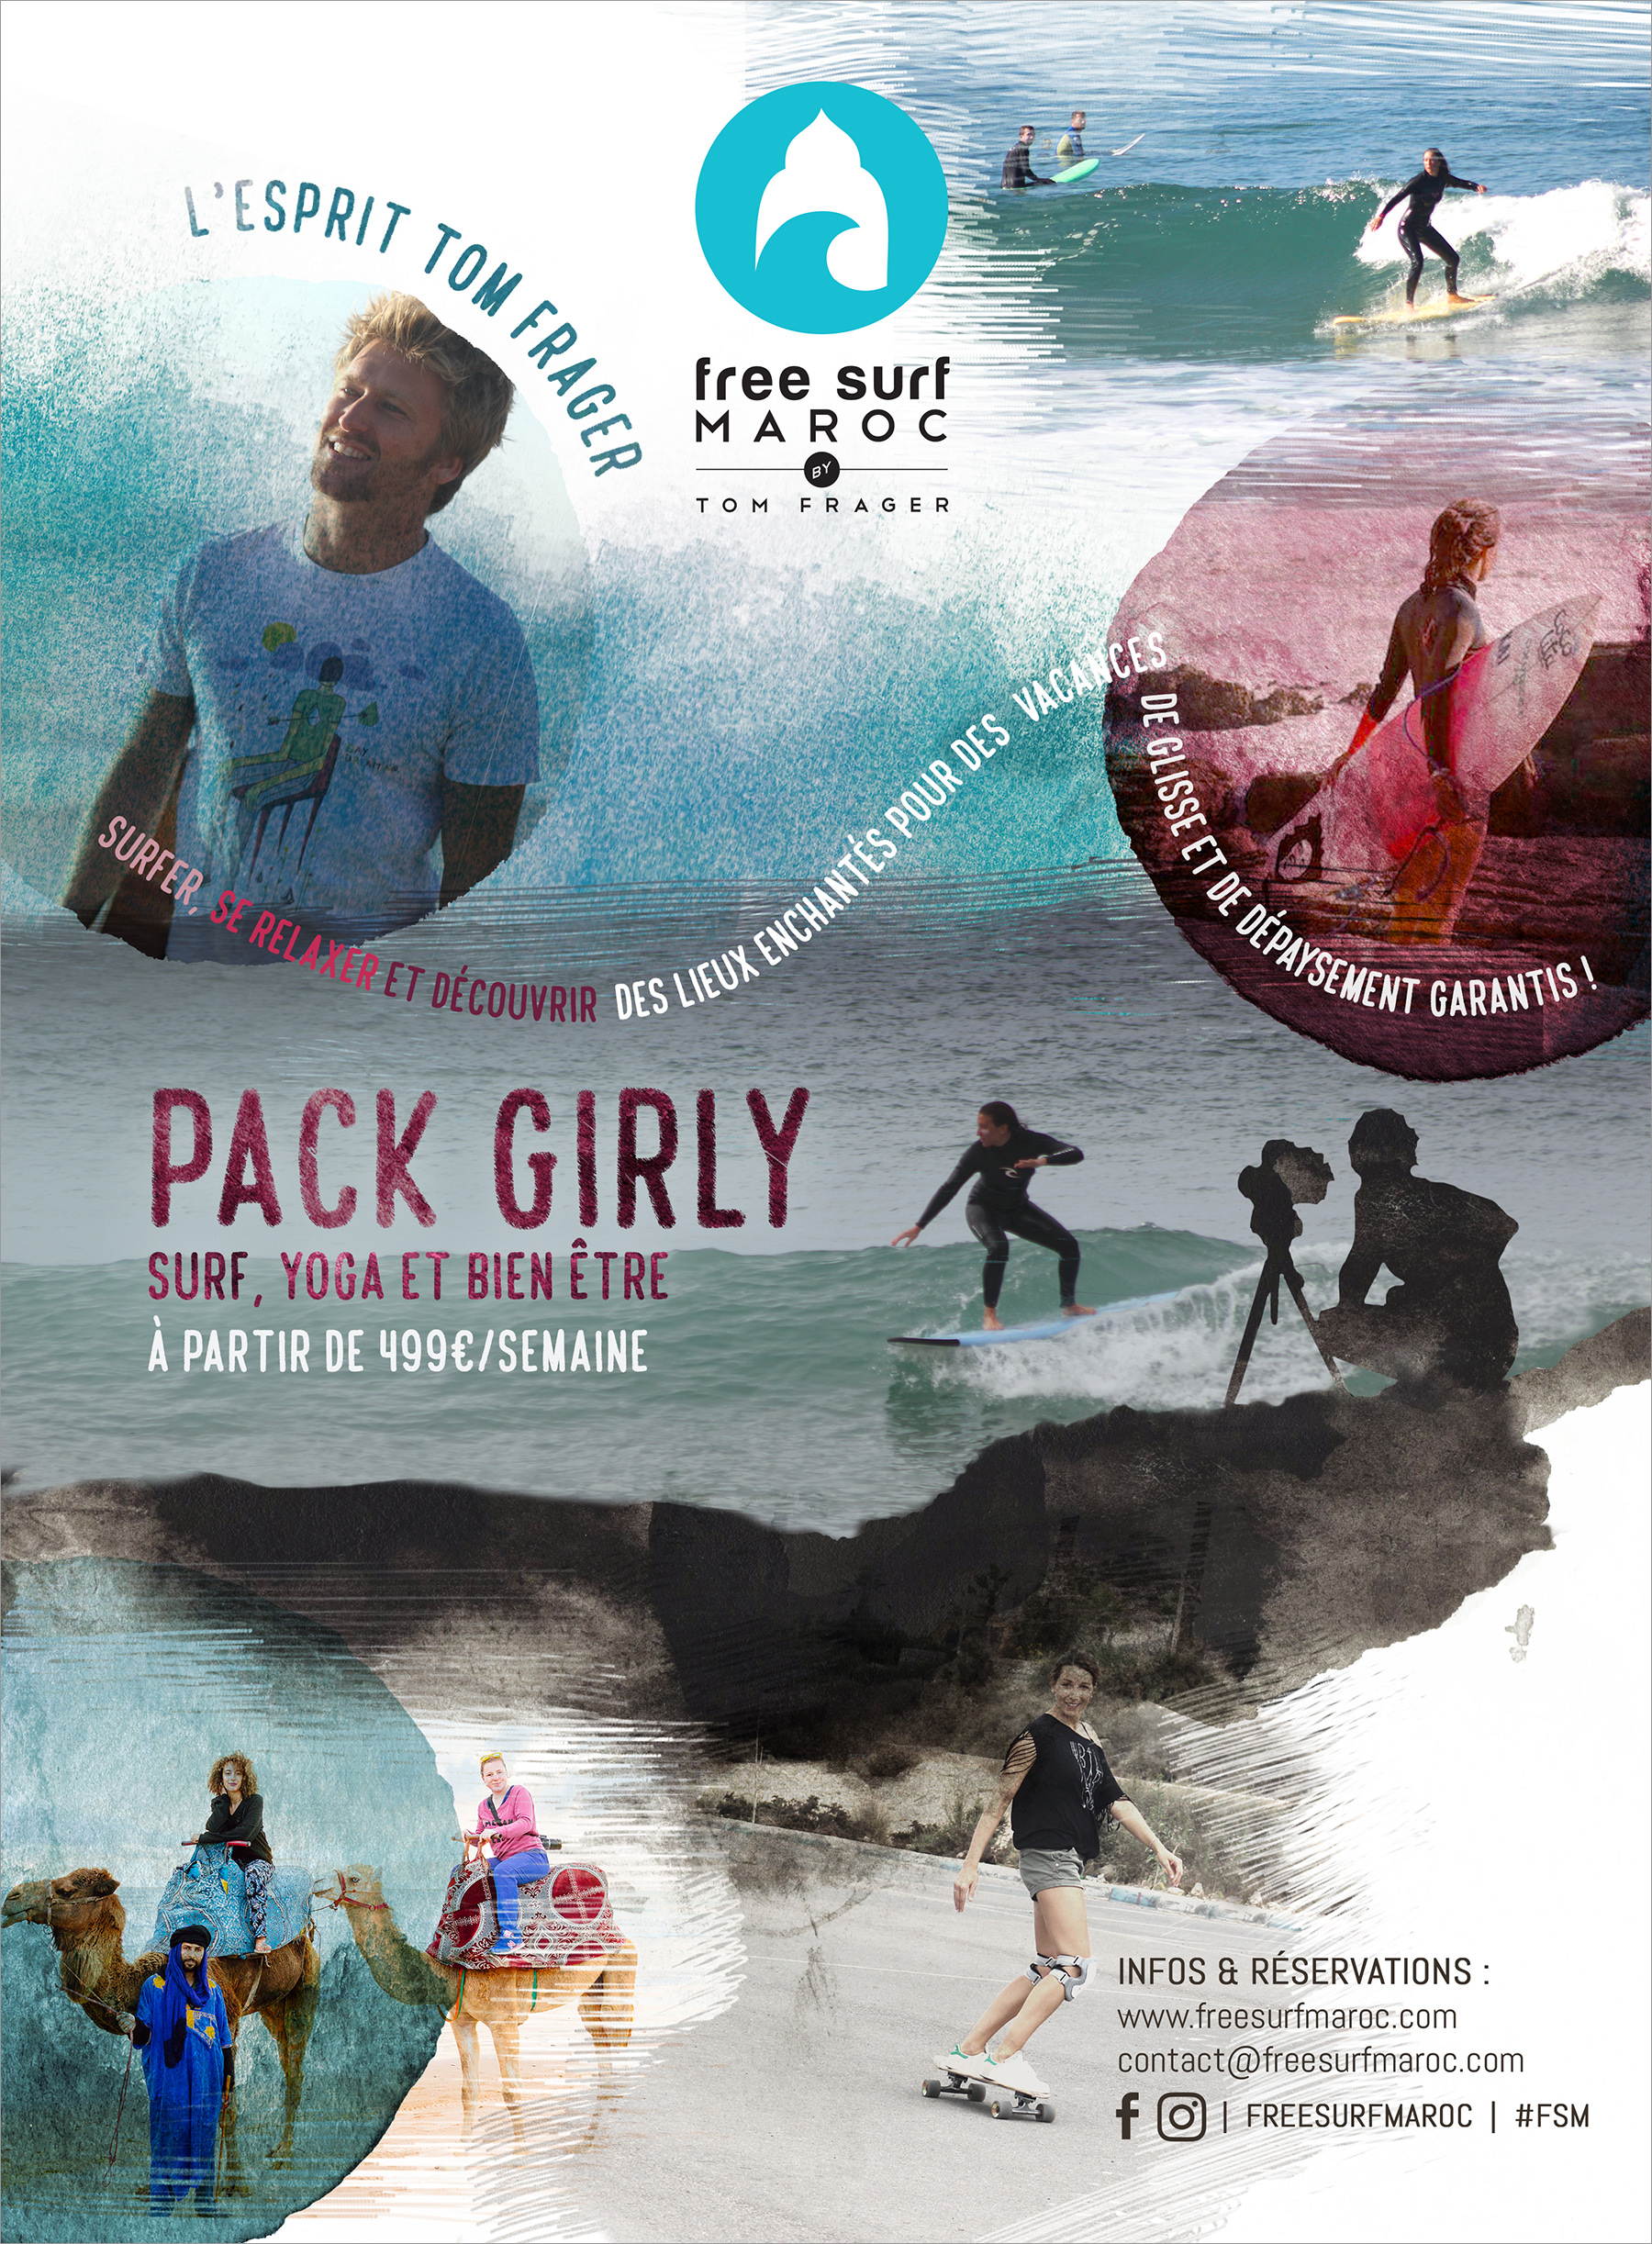 girl-surfsession-freesurfmaroc-vaguegraphique-graphiste-vannes-bretagne